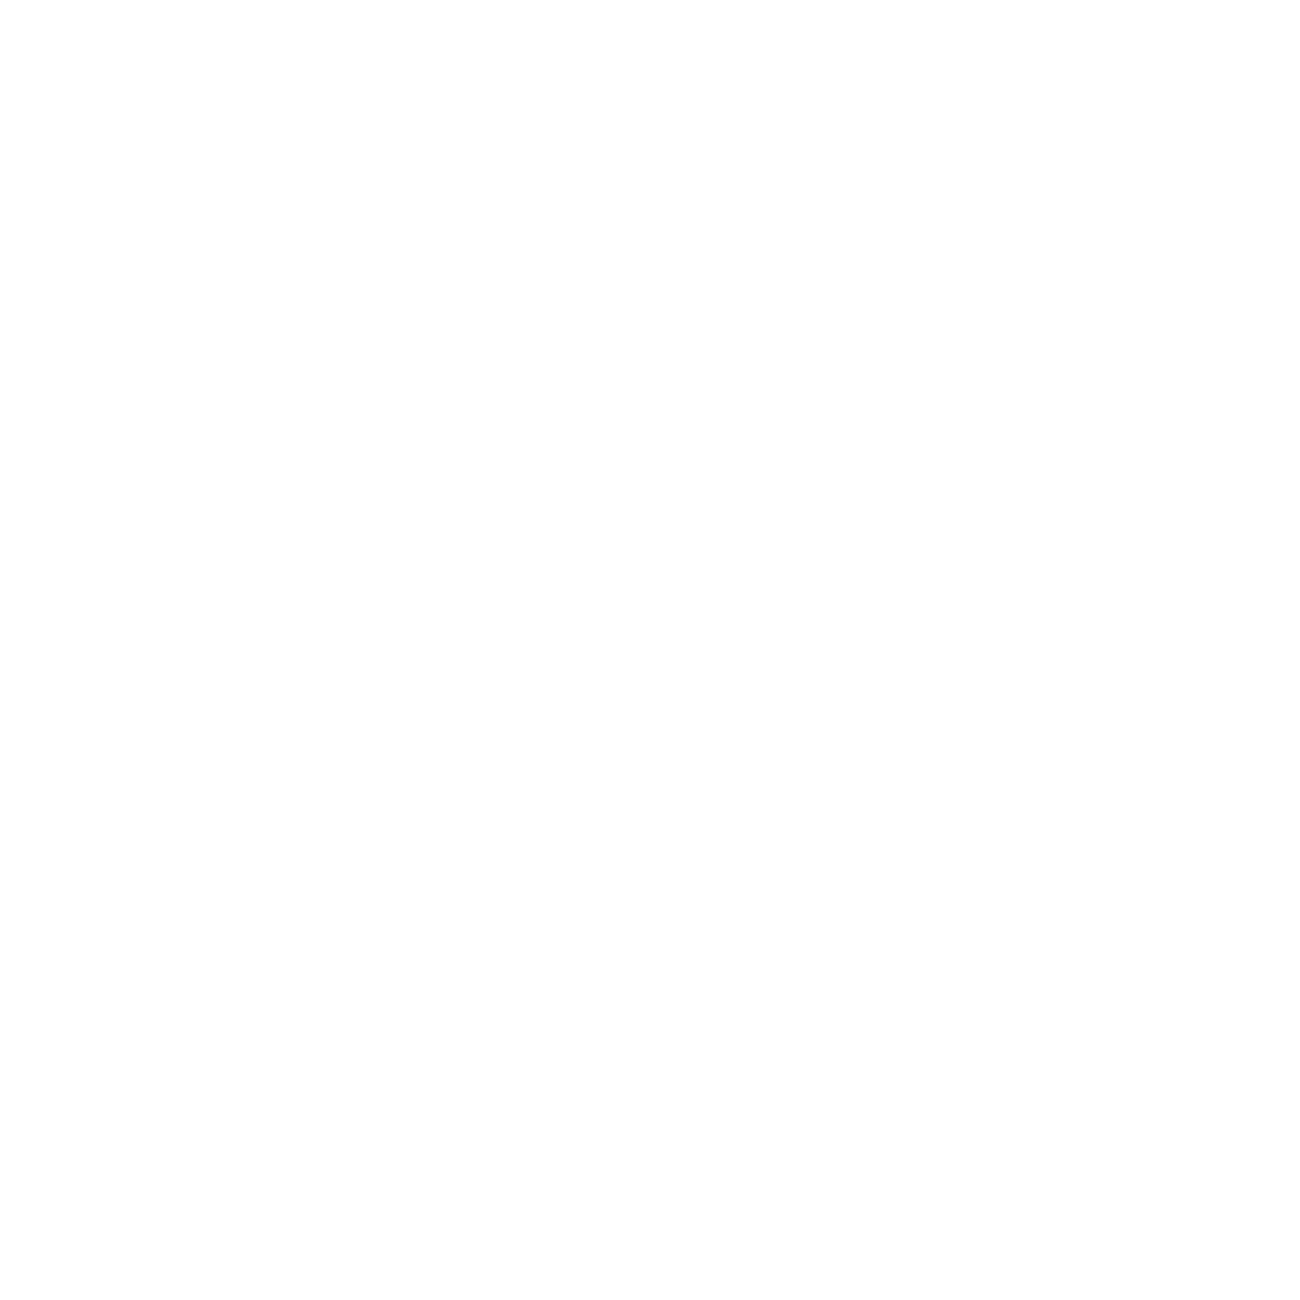 rs_logo-symbol-white_rgb